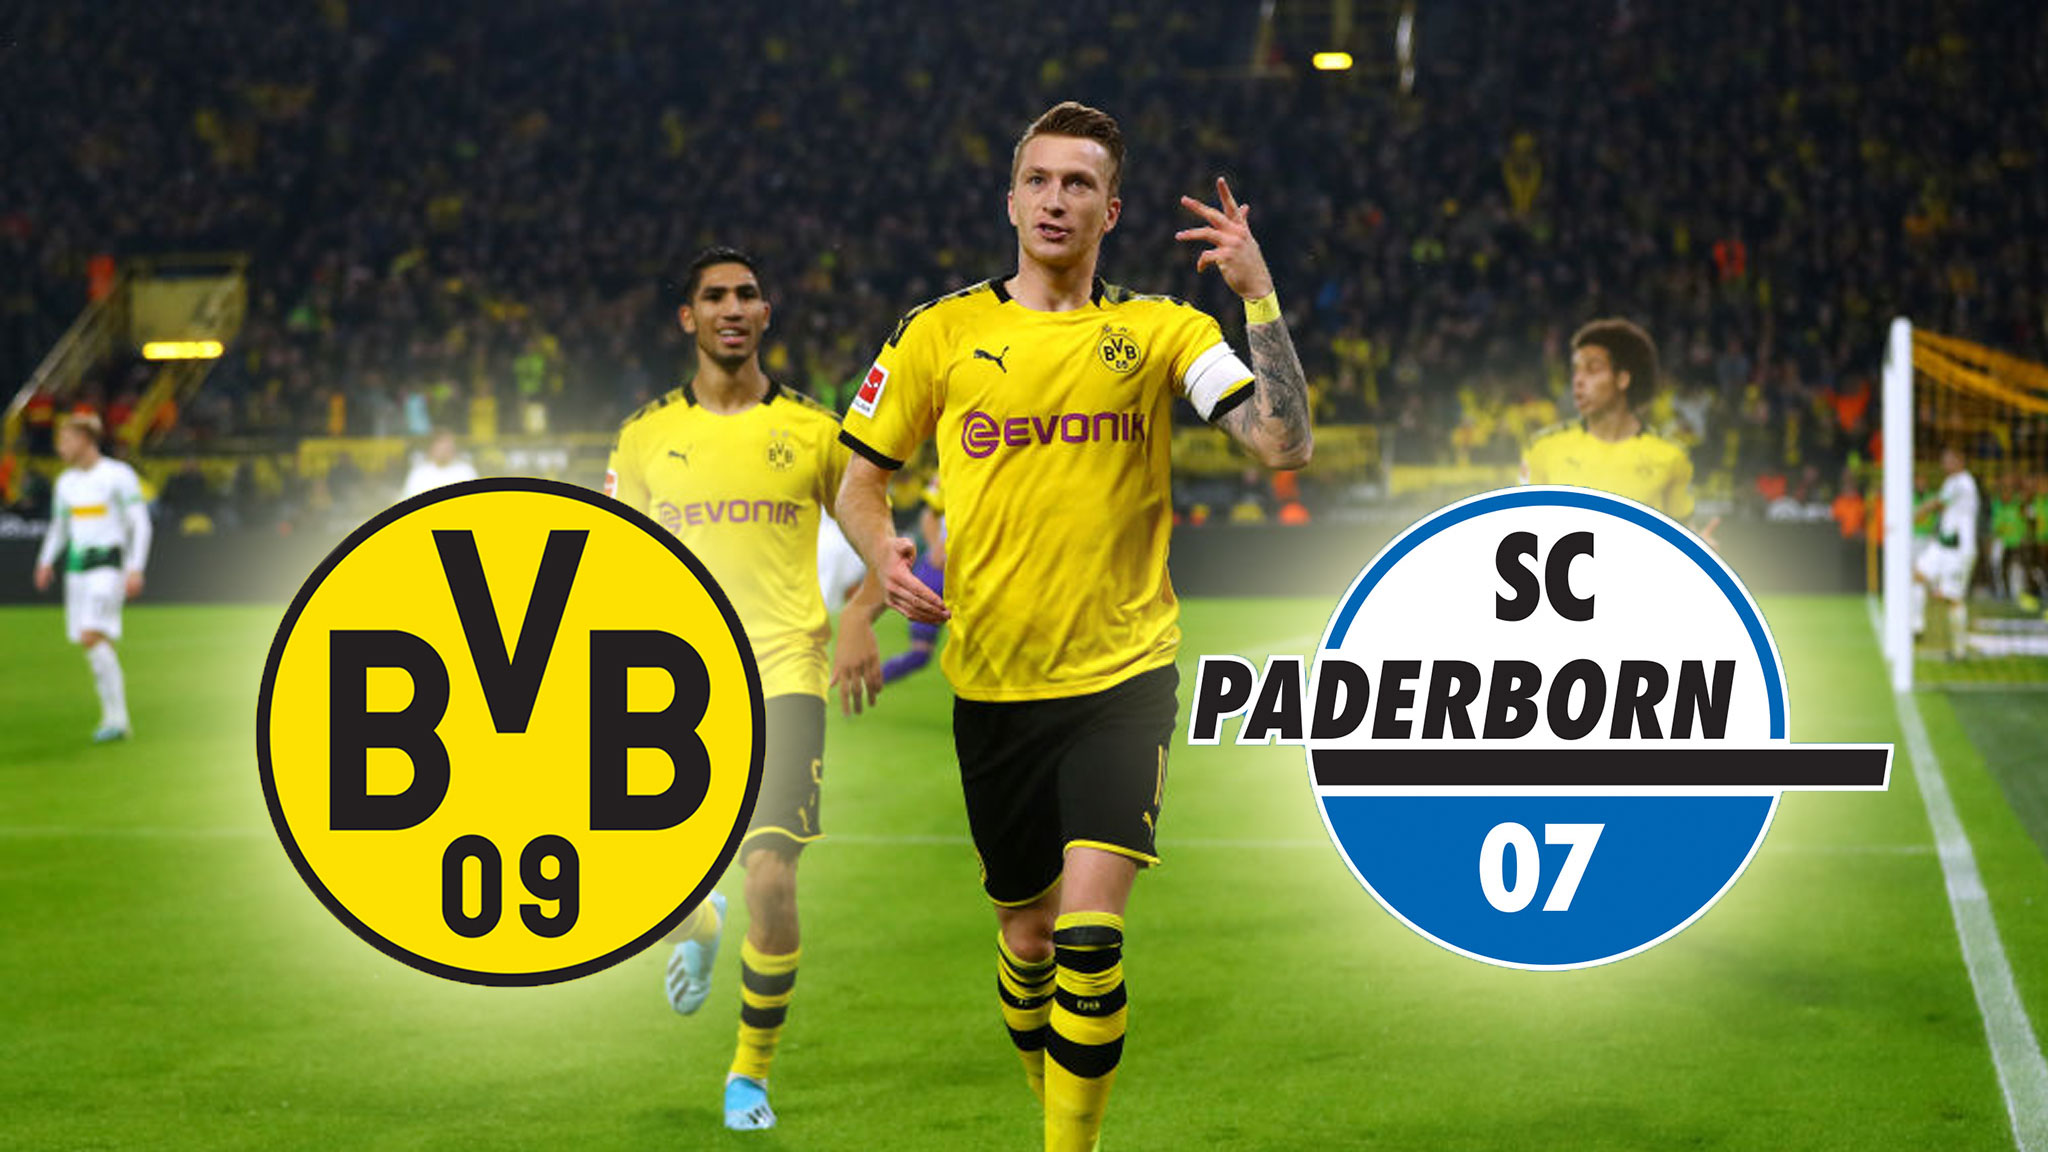 Bvb Vs Paderborn Die Bundesliga Heute Im Tv Und Live